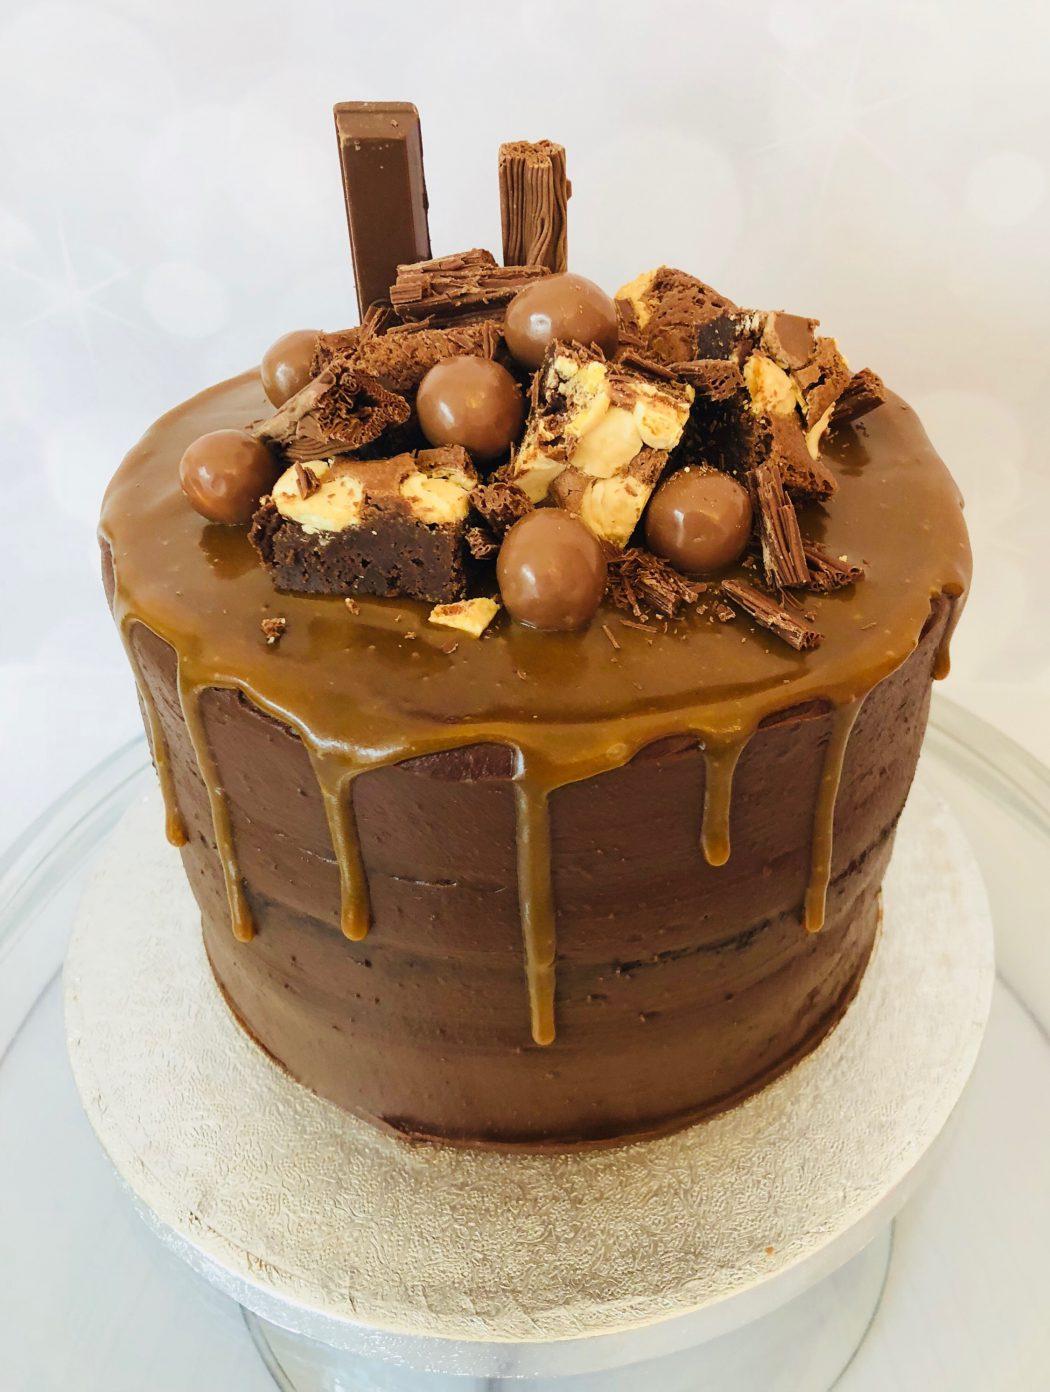 Chocolate, caramel and brownie cake